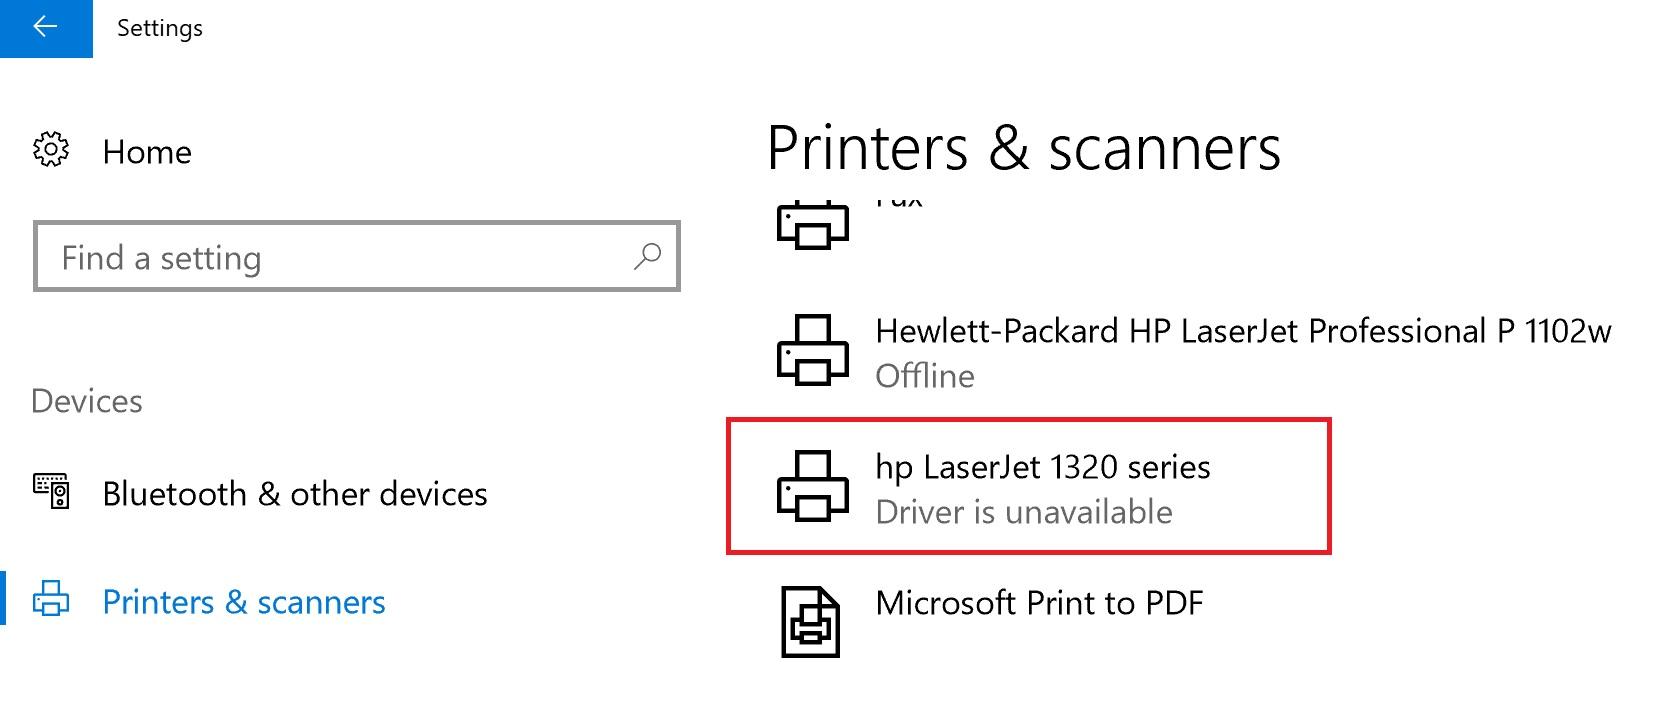 Hp laserjet 1320 series driver & software download.